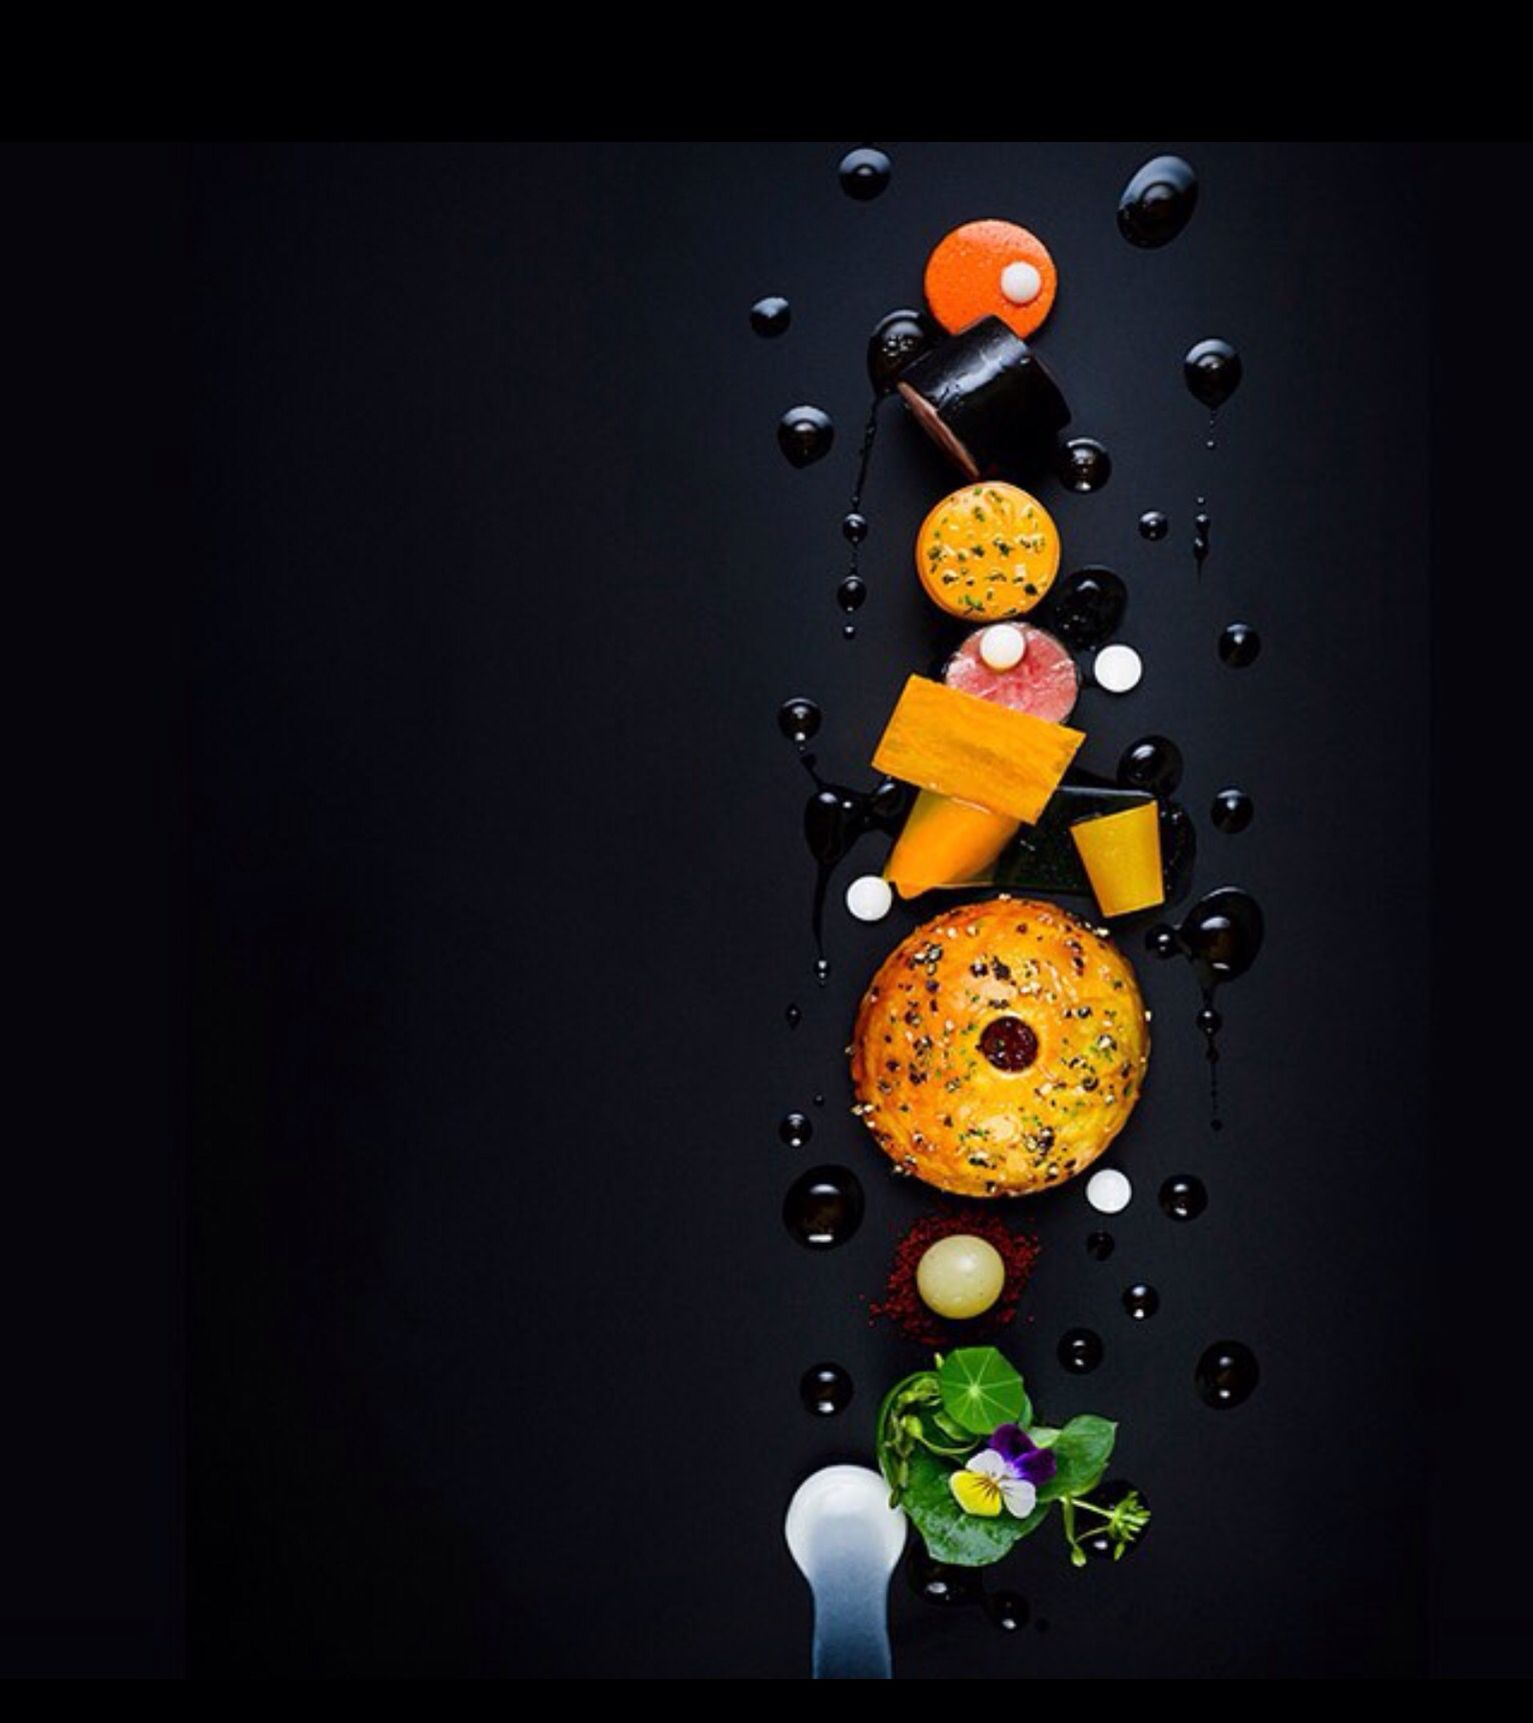 Chef Paul Liebrandt. The Art of Plating